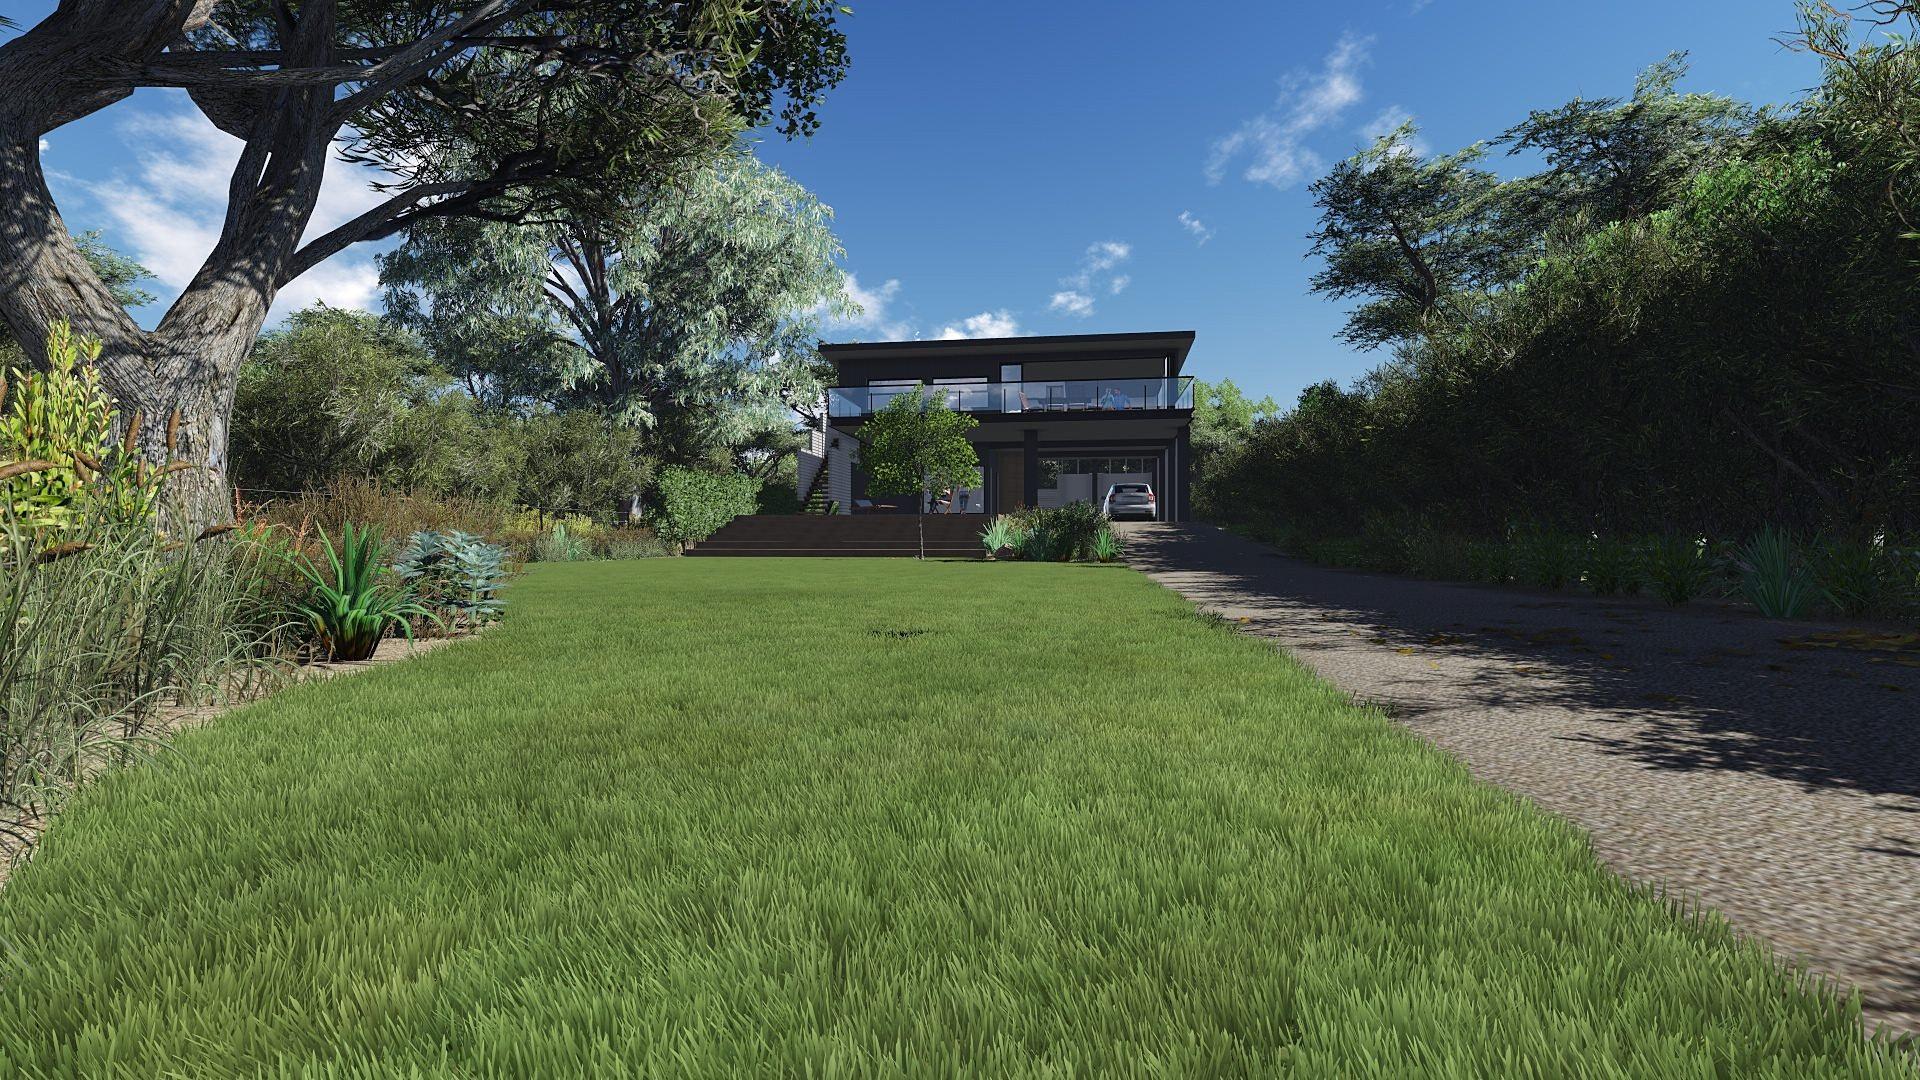 3d visualiseringar, trädgårdsdesign, ritningar, bygglovshandlingar ...